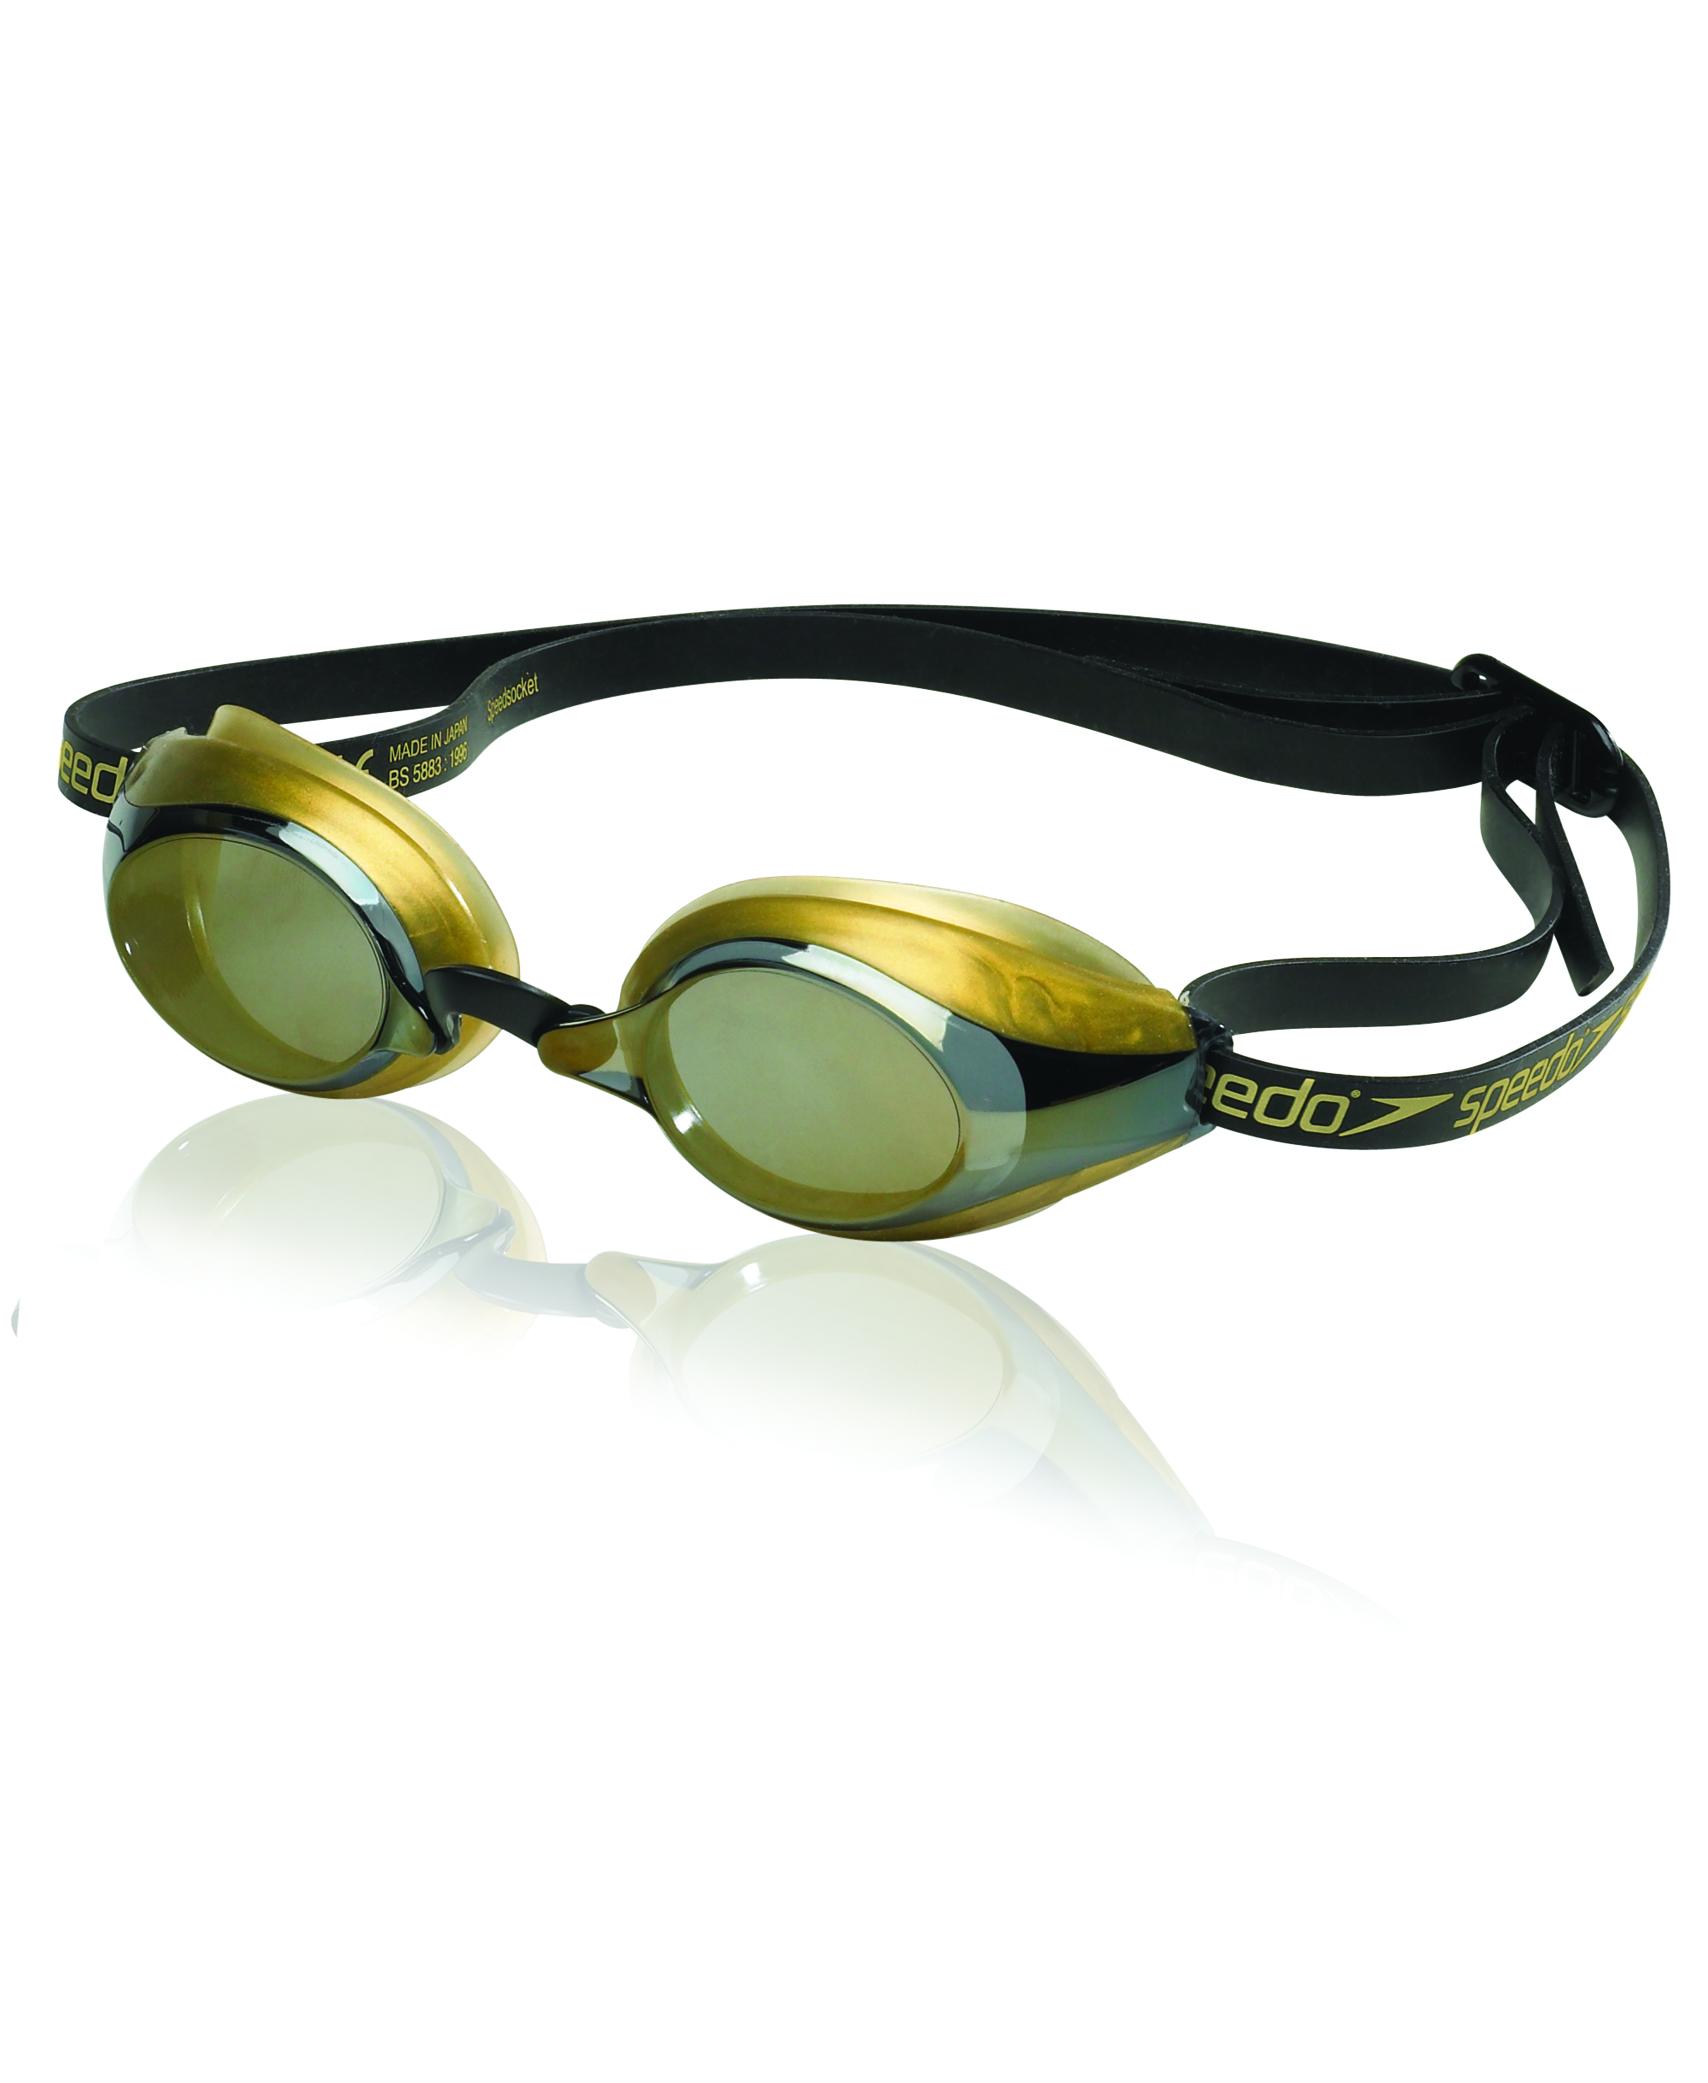 fc5b1fe6f8 Prescription Swimming Goggles At Walmart - Bitterroot Public Library